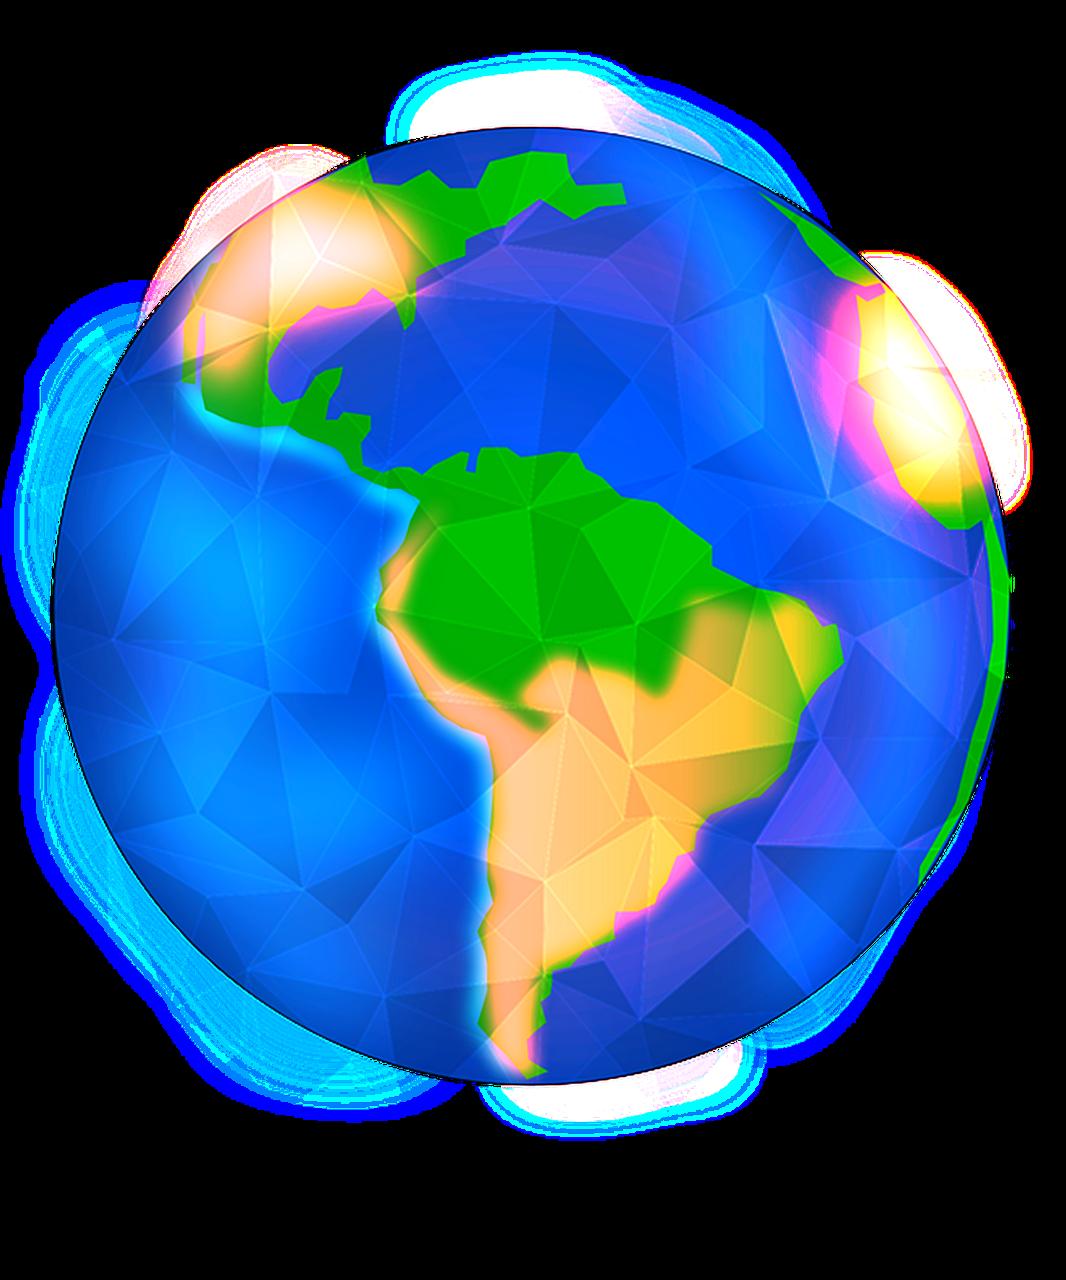 Earthglobaltshirtearth pngpainting free photo from needpix earth global tshirt gumiabroncs Images